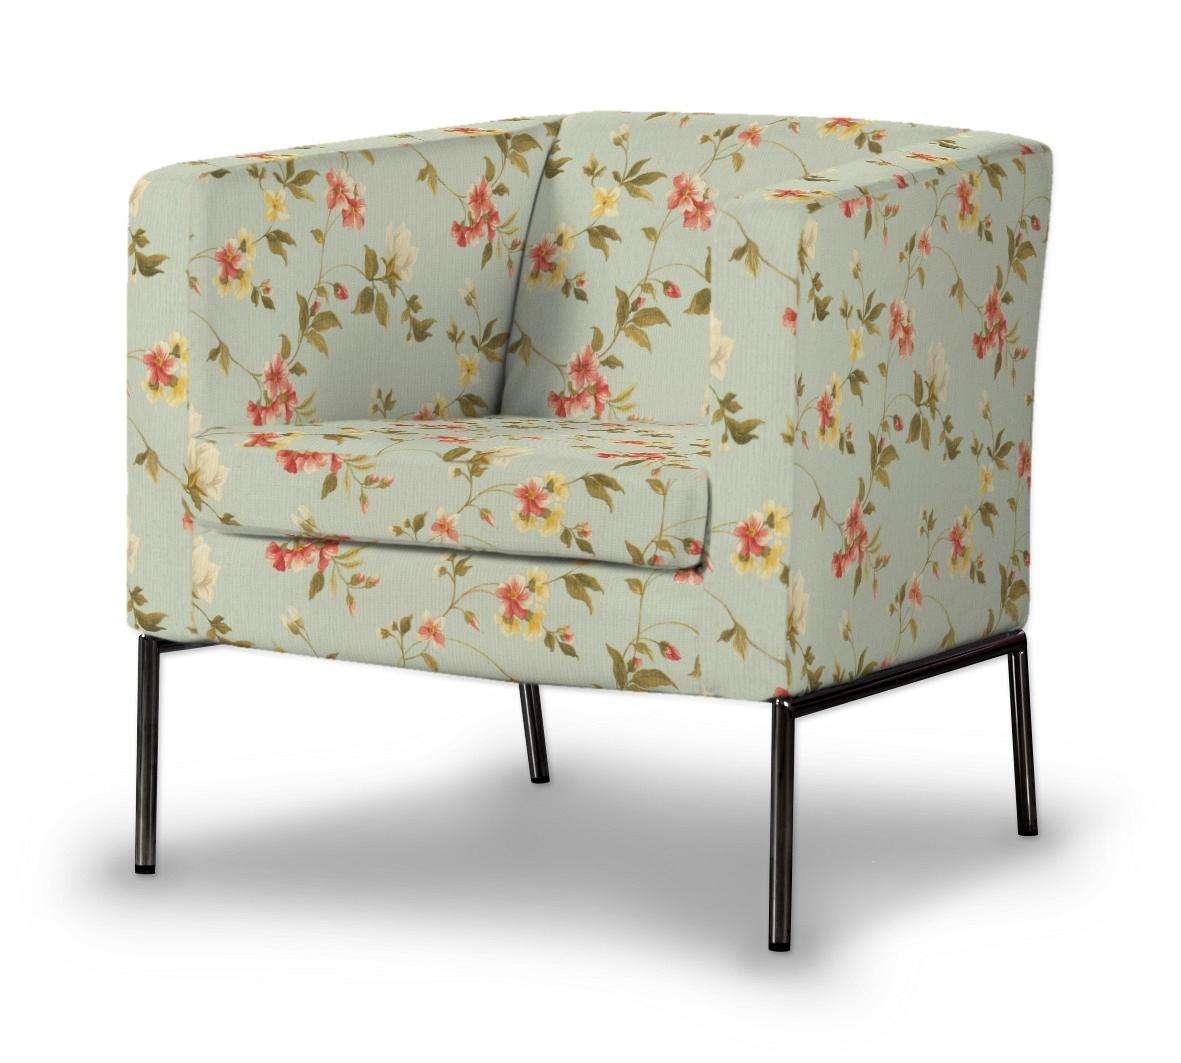 Klappsta Sesselbezug Sessel Klappsta von der Kollektion Londres, Stoff: 124-65